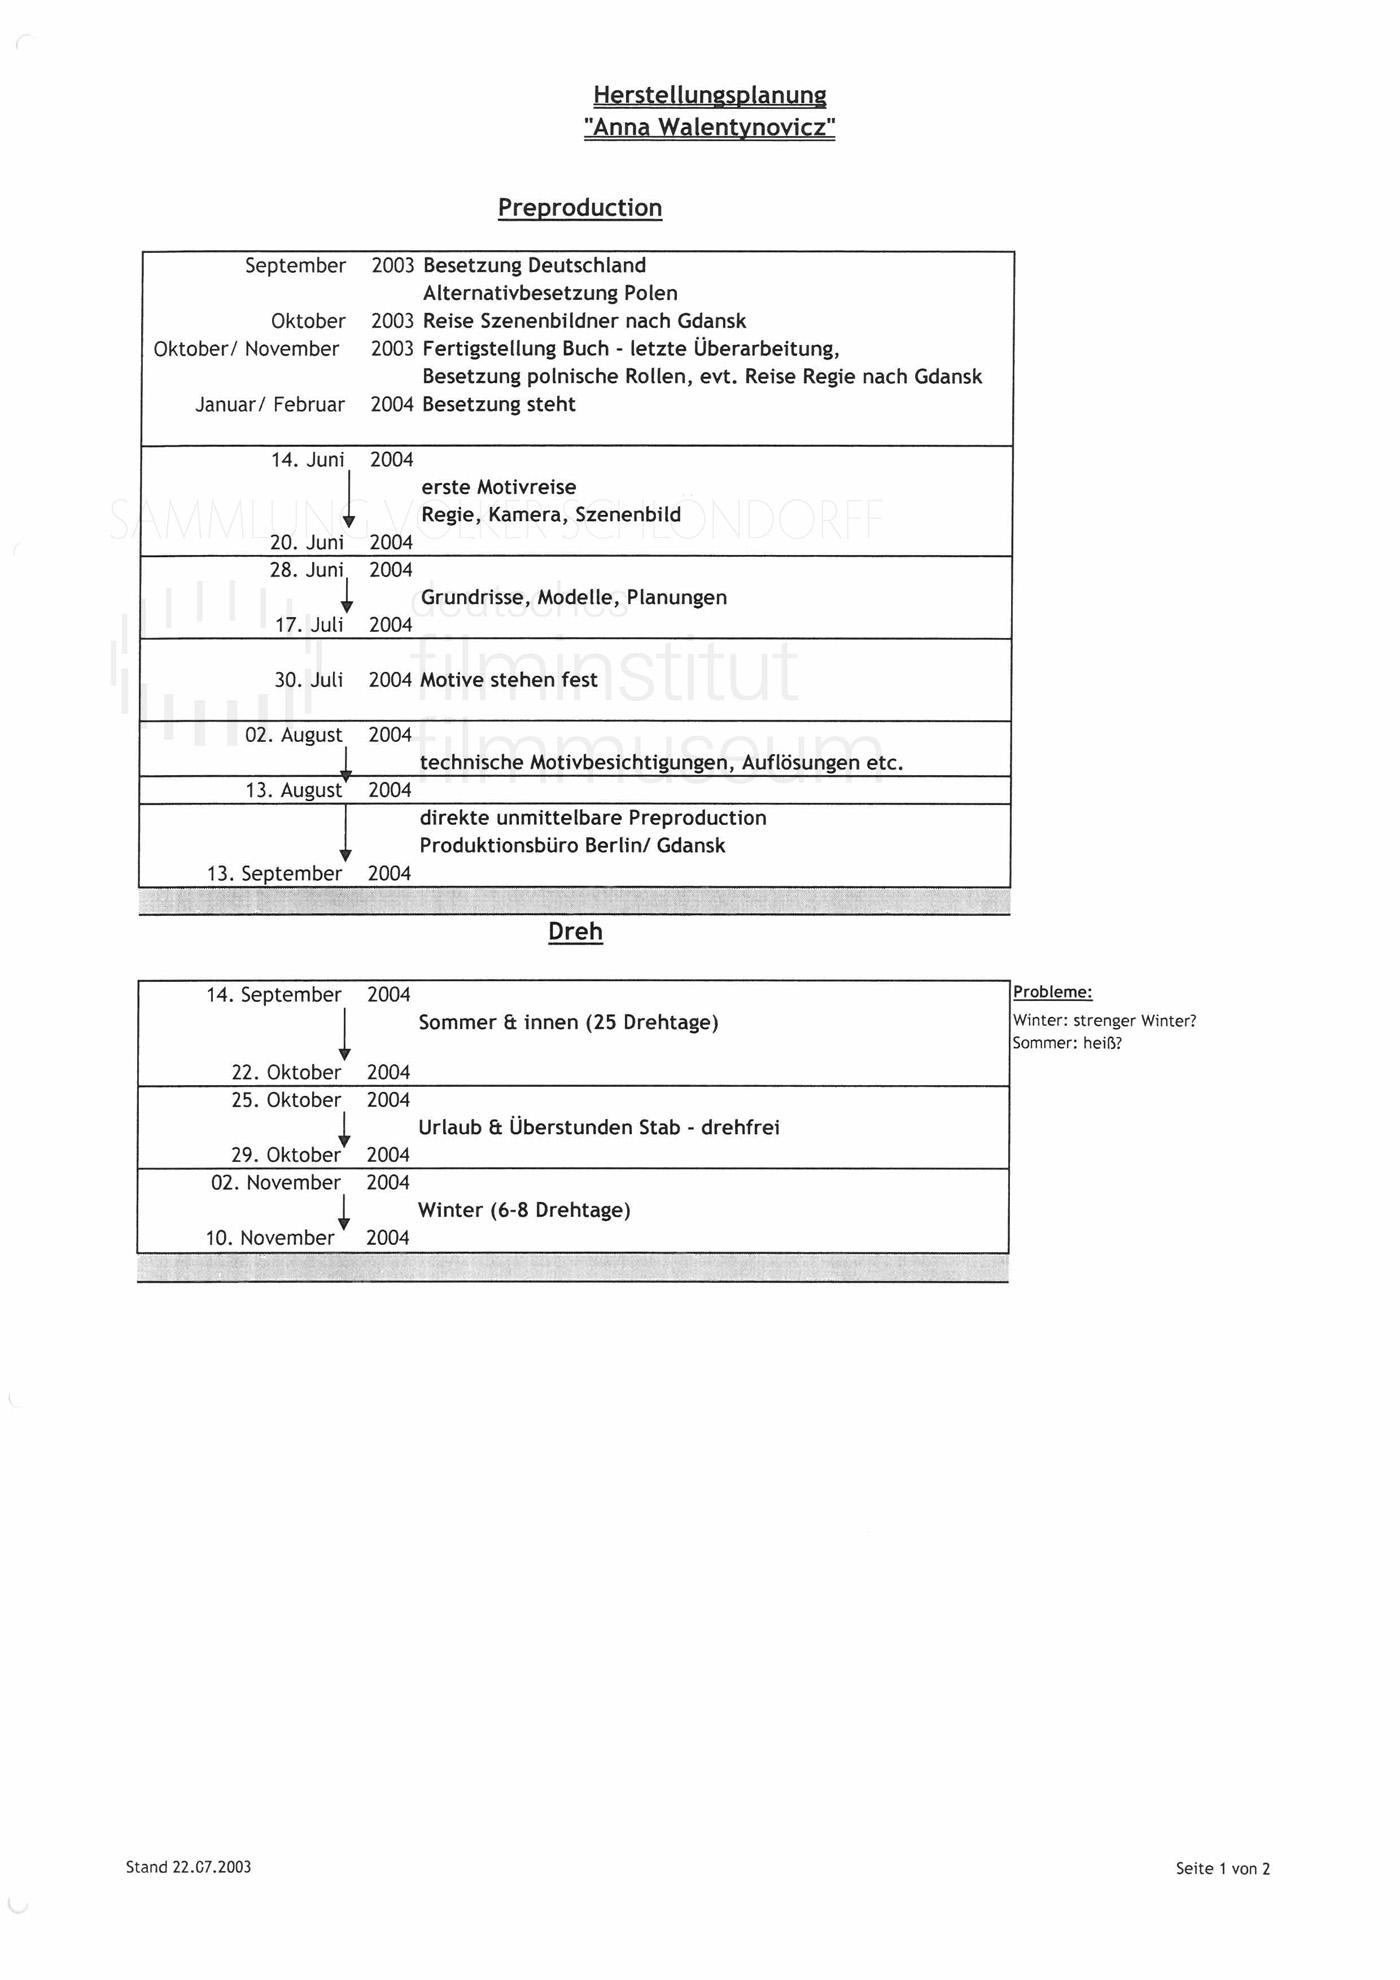 STRAJK // Produktionsmaterial / Herstellungsplanung, 1c